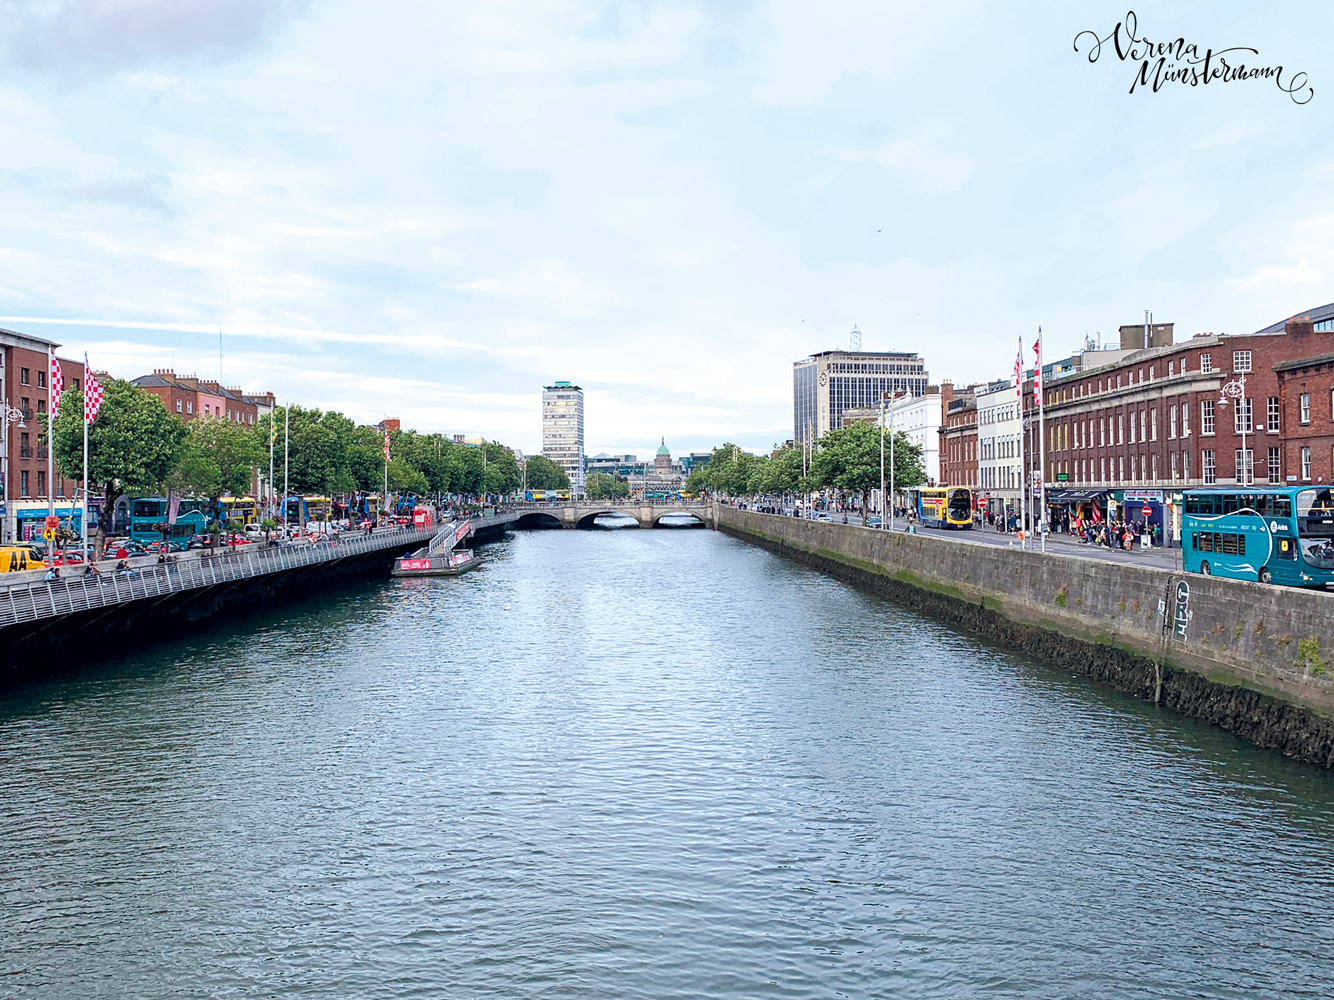 Dublin - Städtetrip - Liffey - verenamuenstermann.de